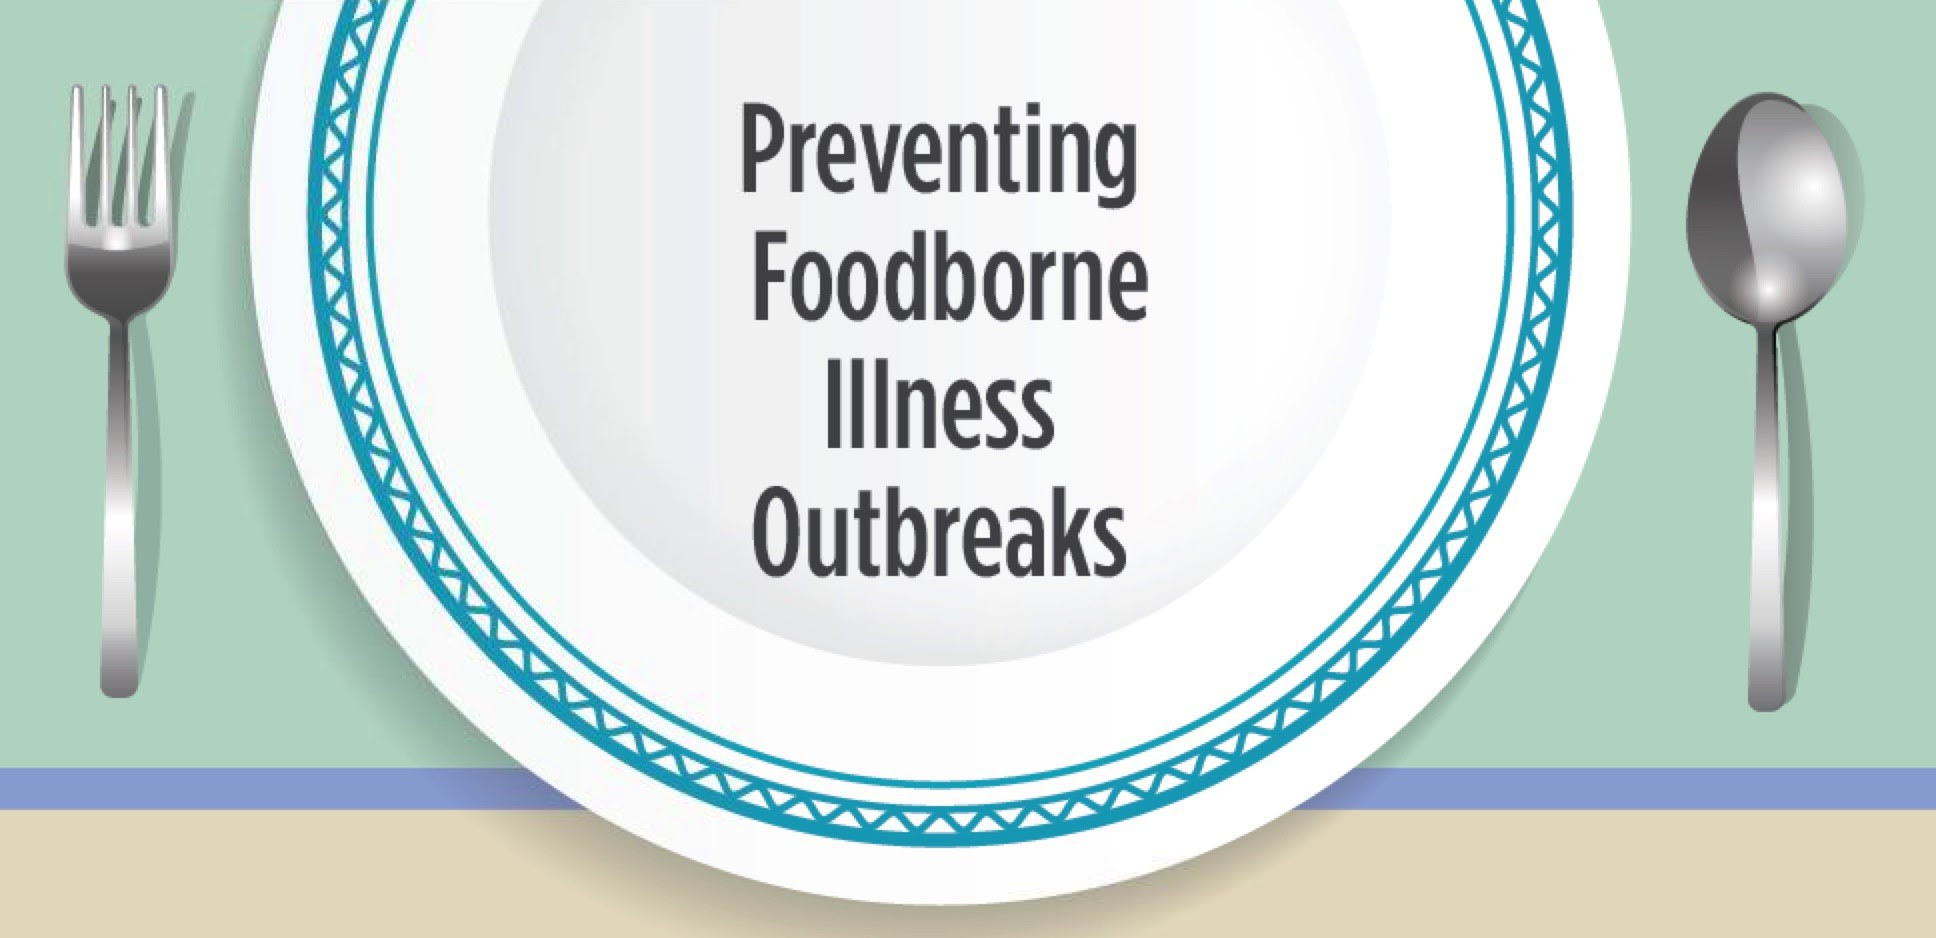 NCEH Foodborne Illness Infographic